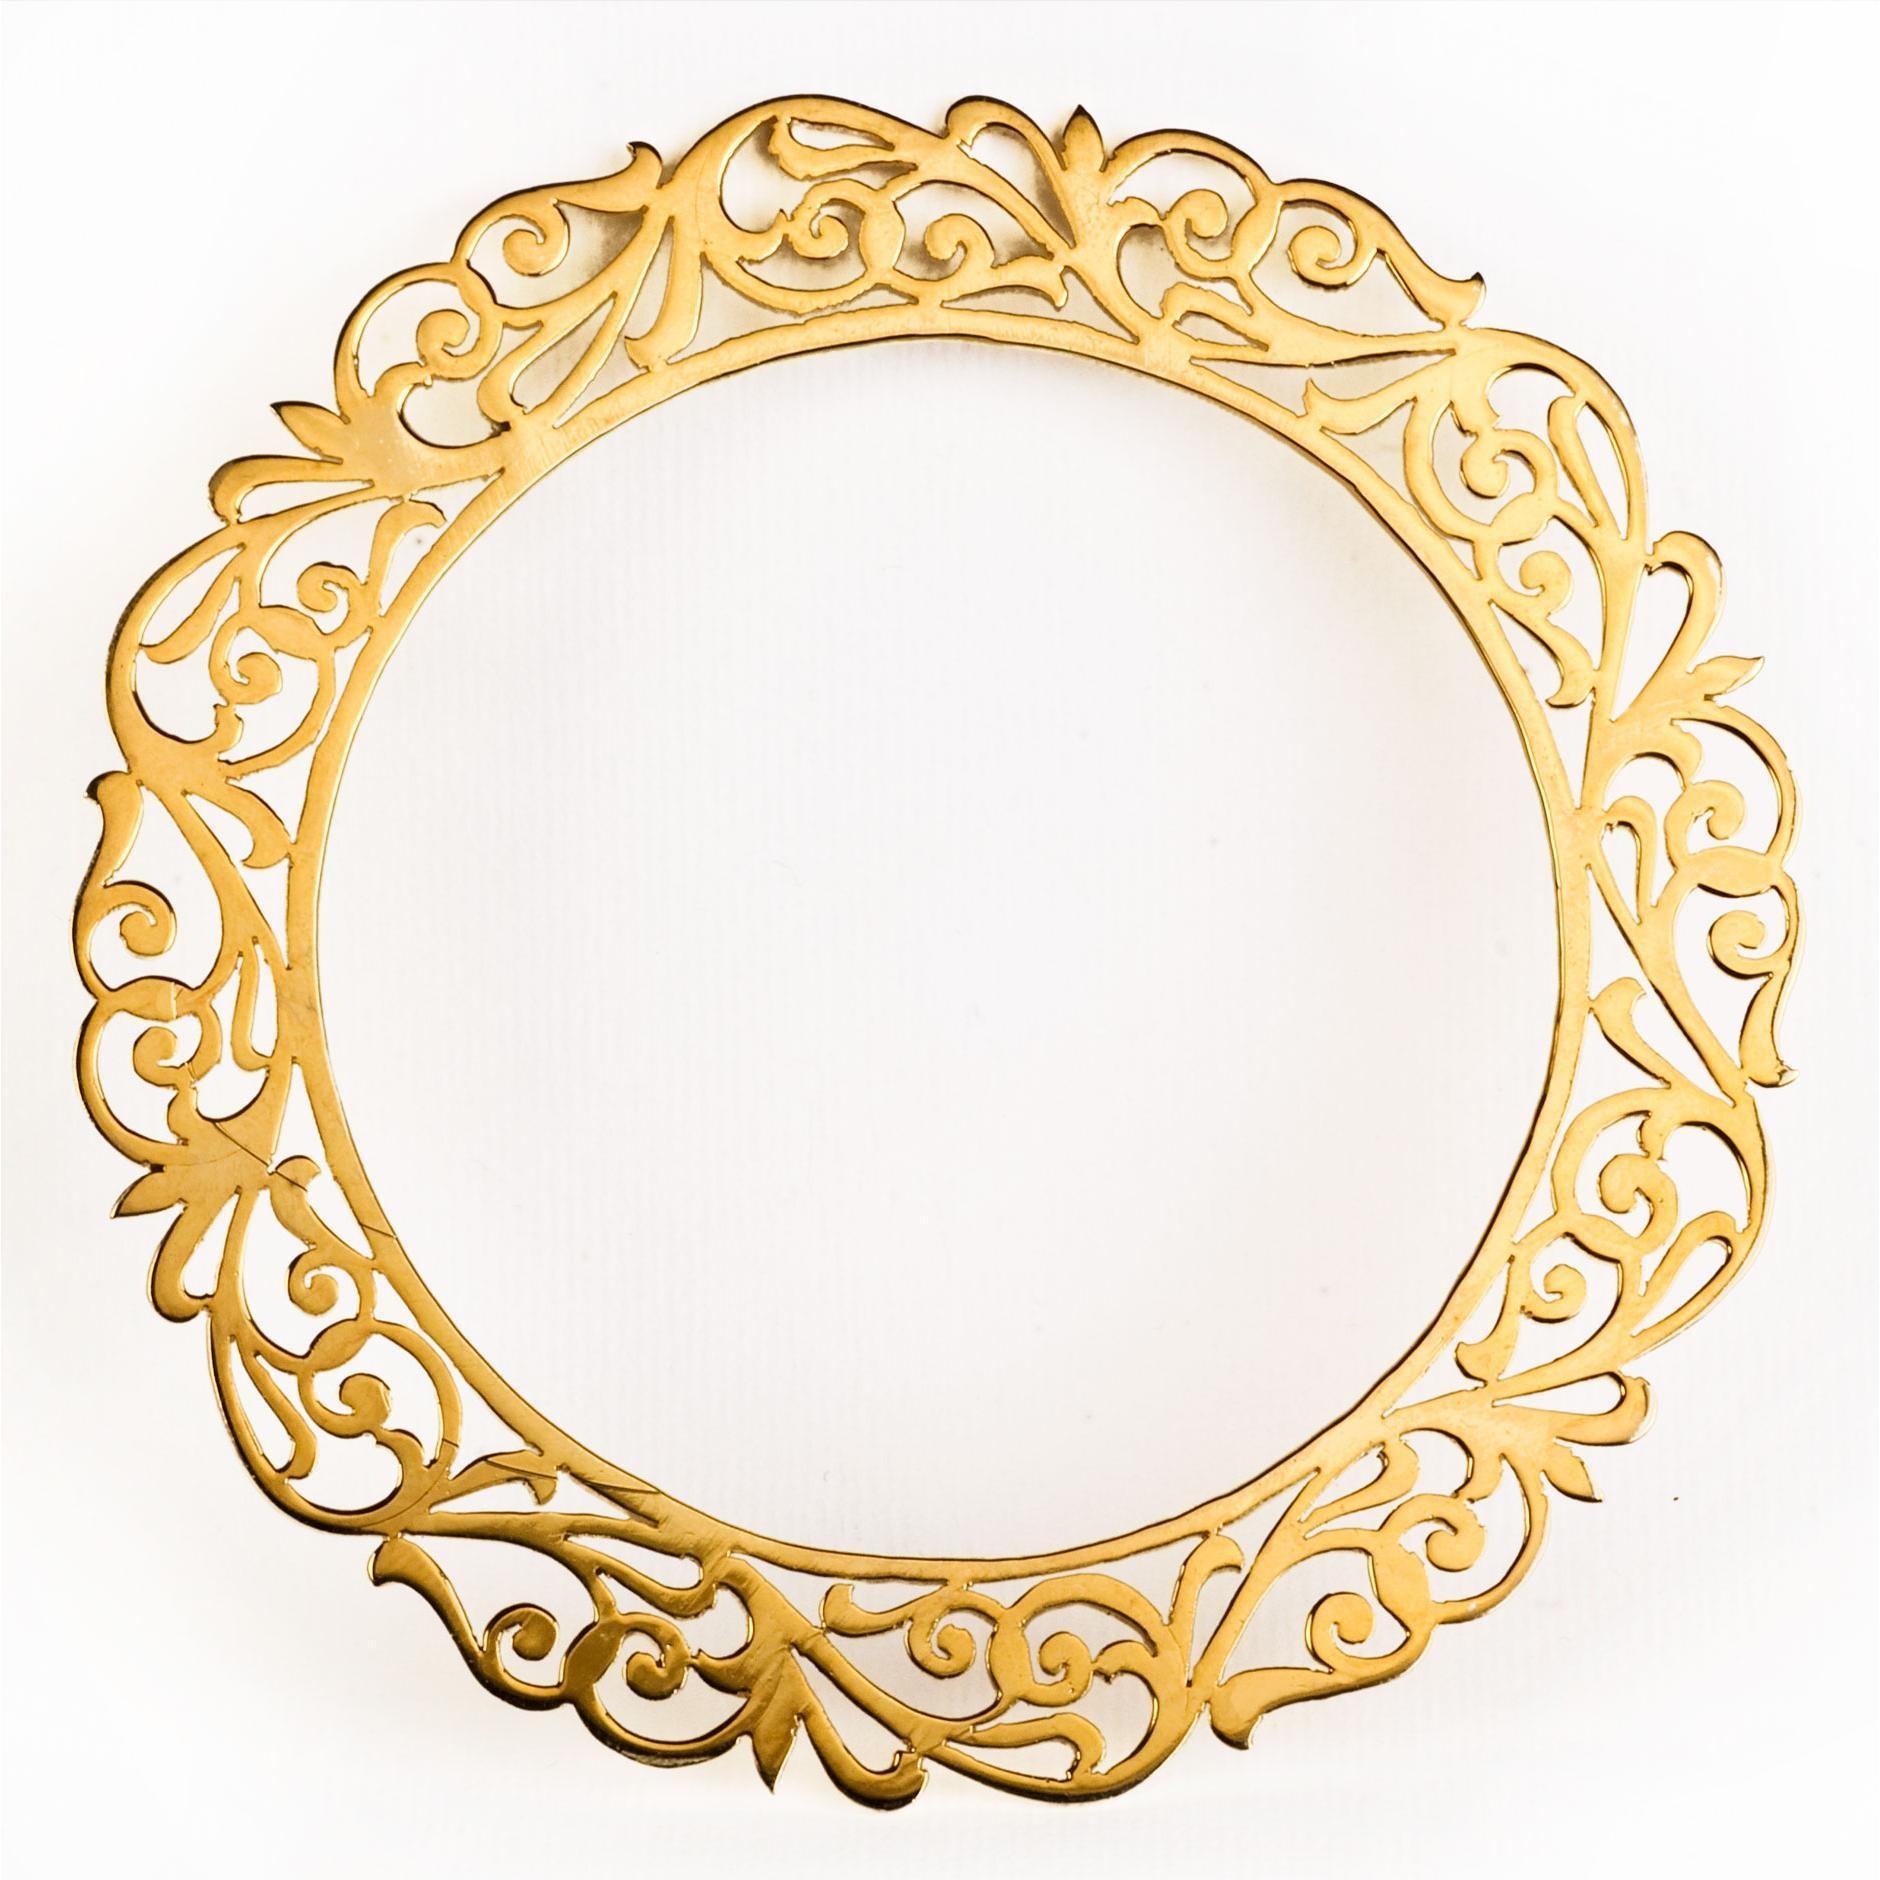 eina-ahluwalia-silver-sudarshan-chakra-bangle-product-1-13857317-4-060836226-normal